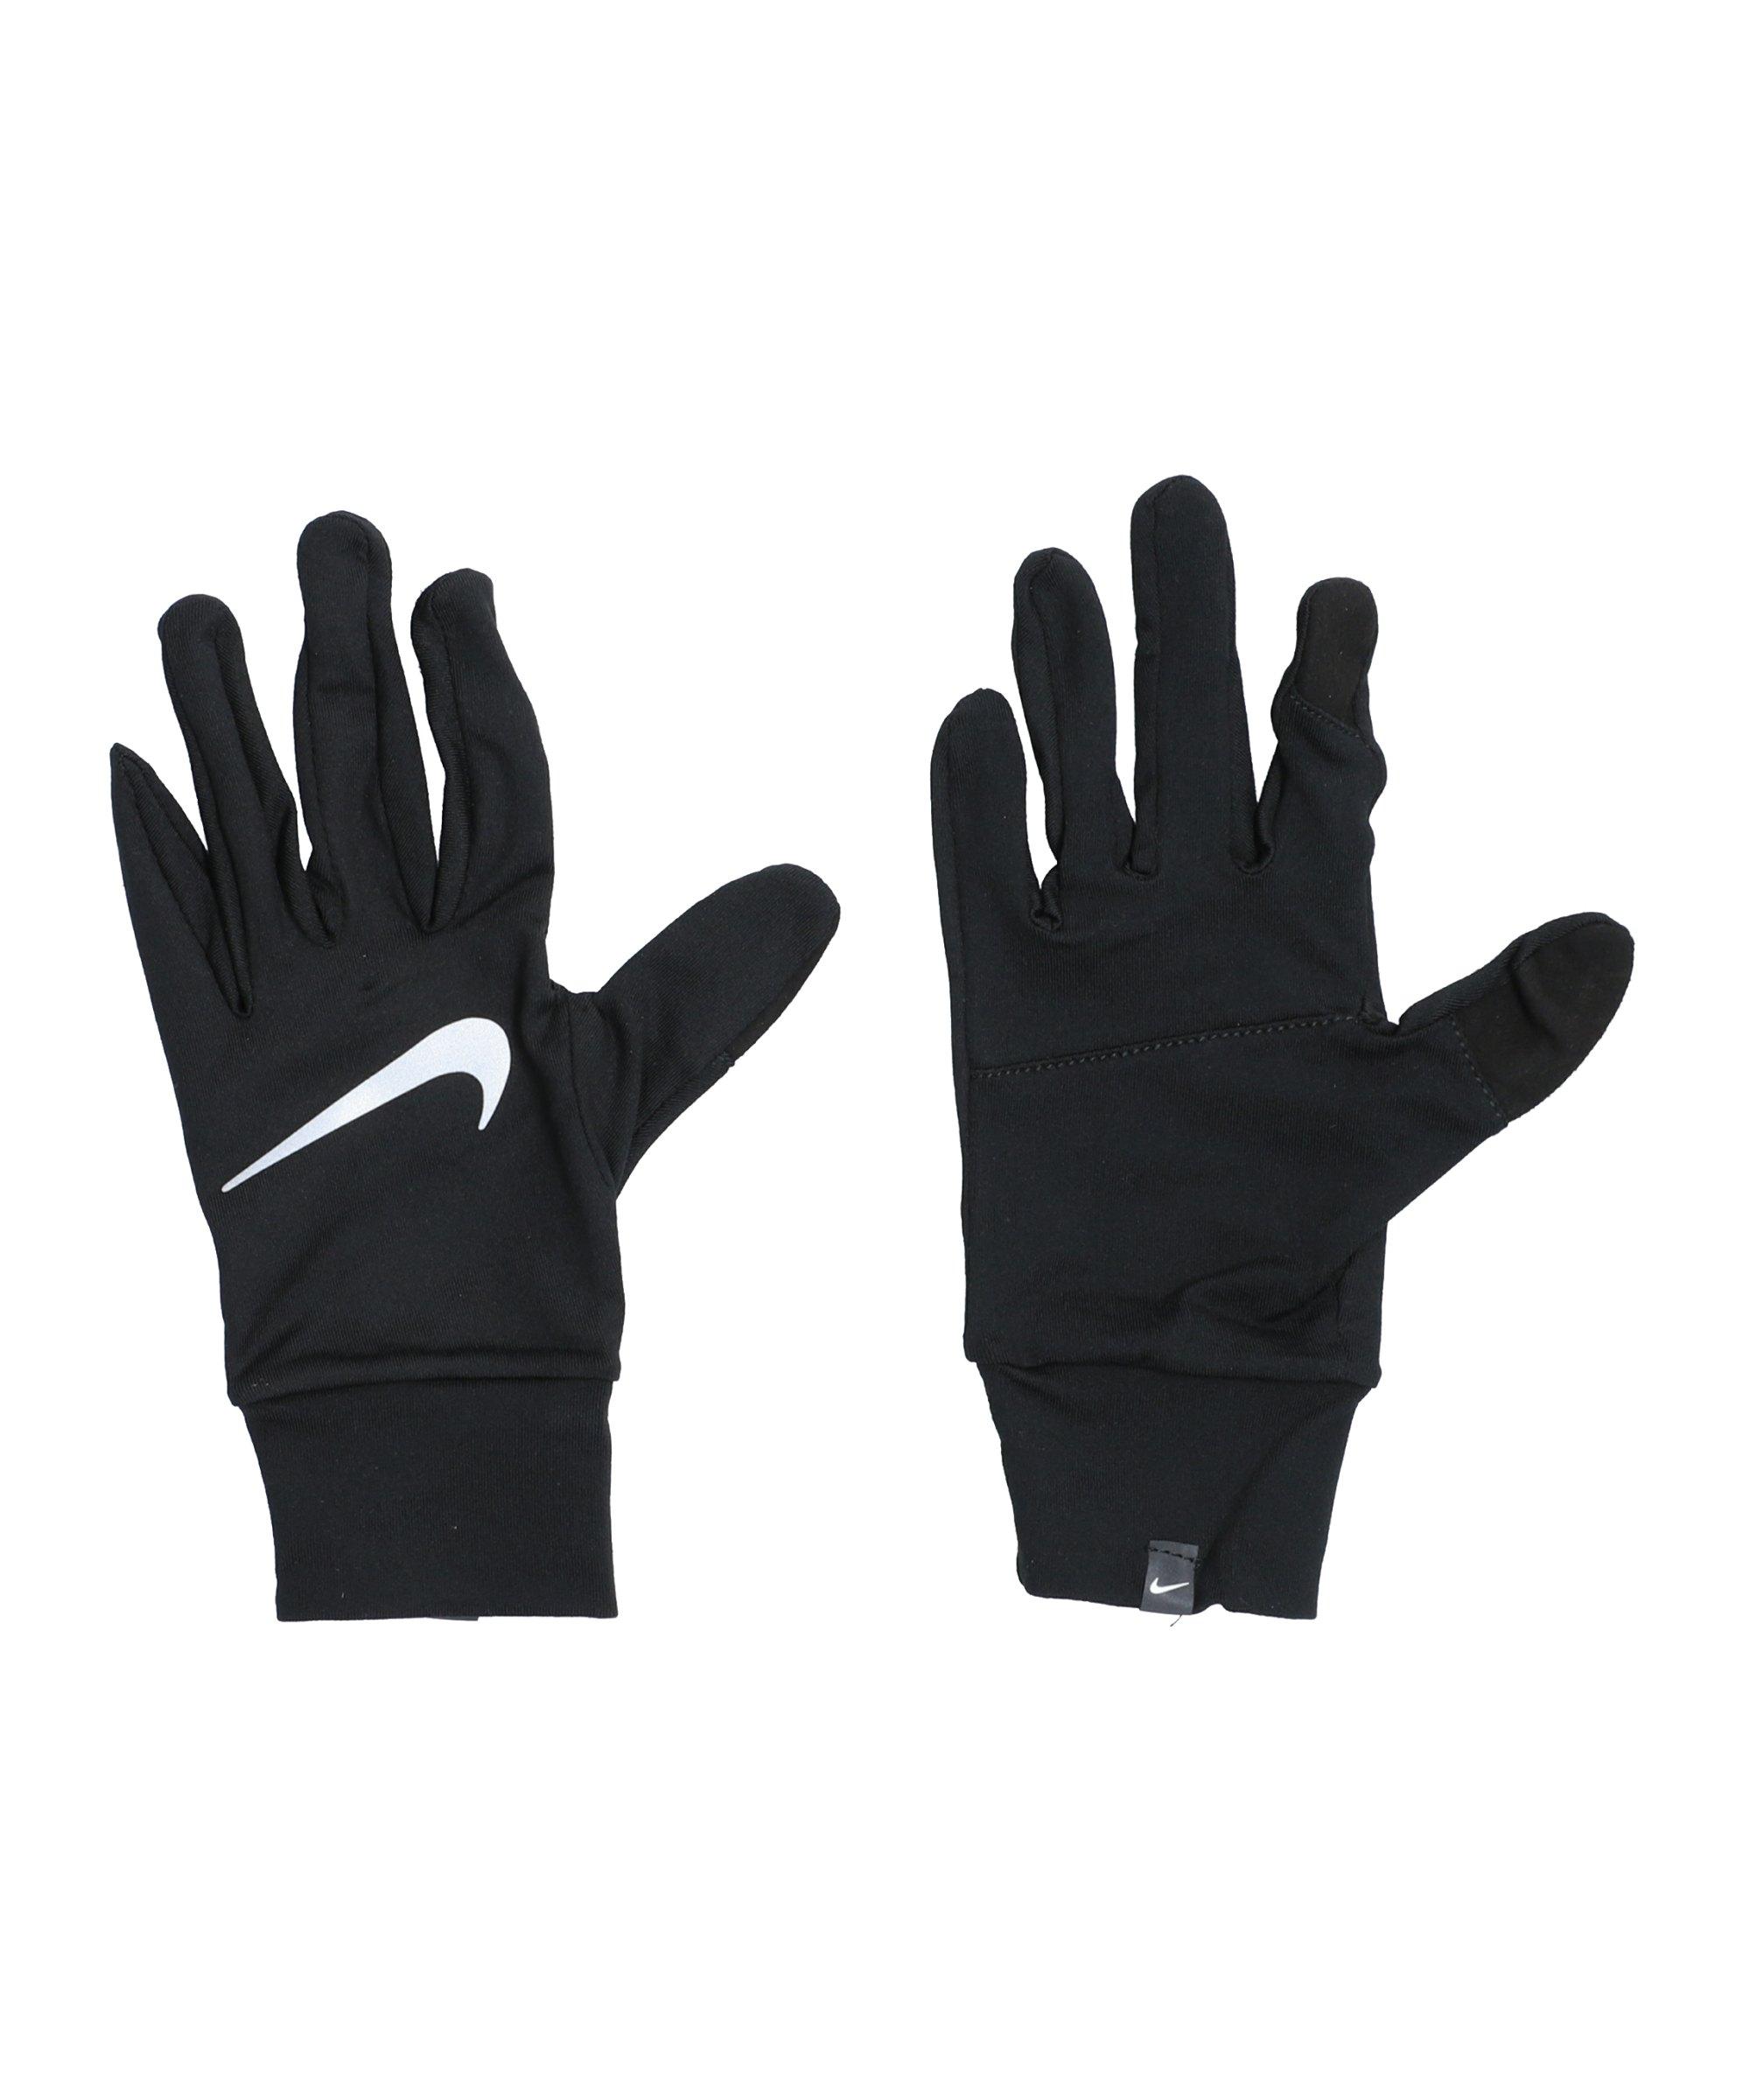 Nike Accelerate Handschuhe Running Damen F082 - schwarz